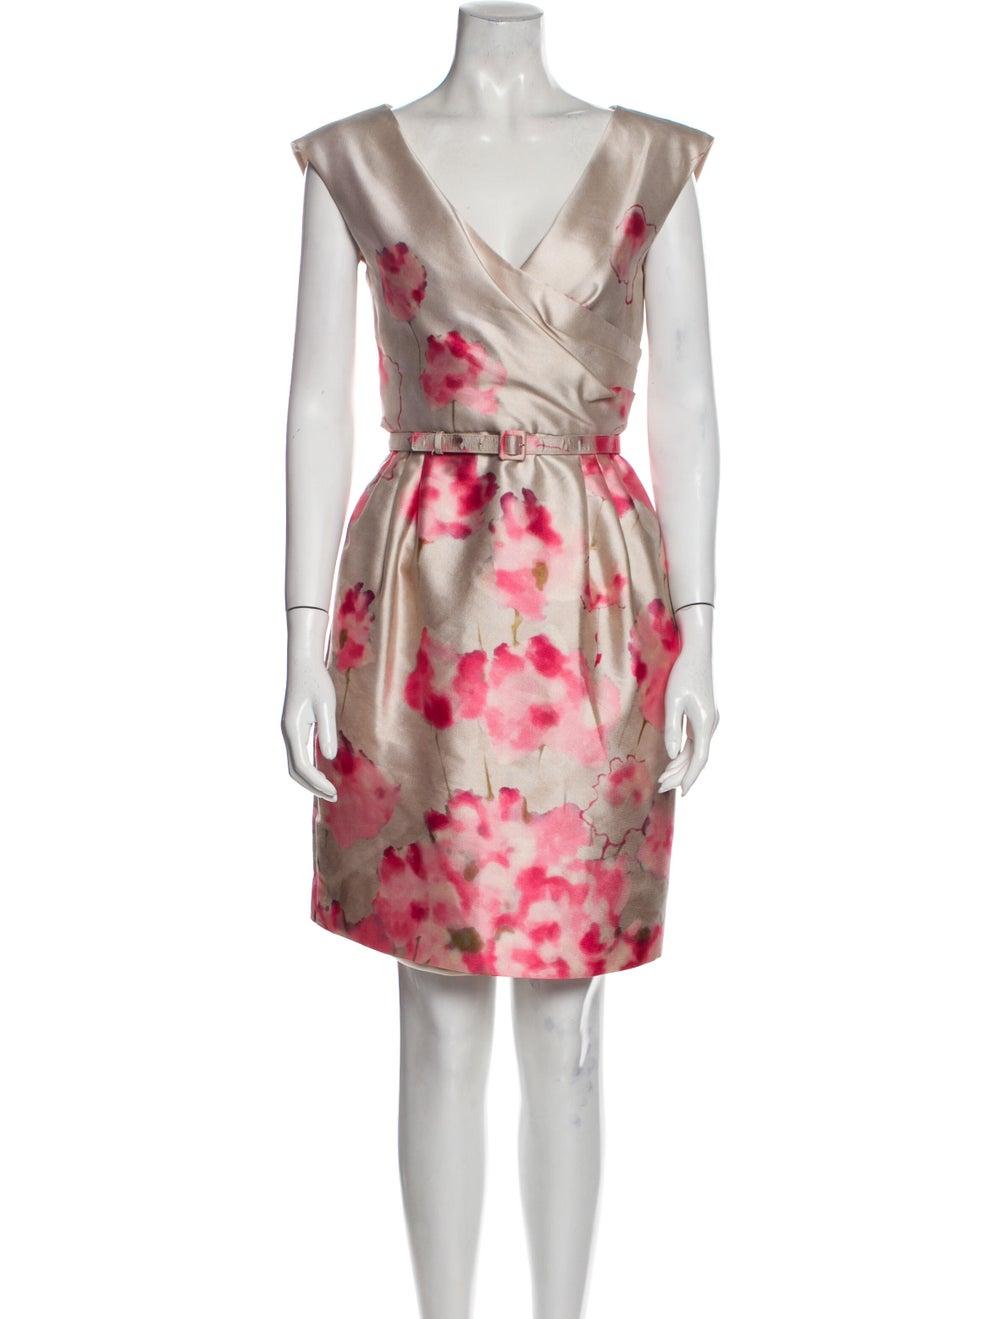 Valentino Silk Knee-Length Dress - image 1